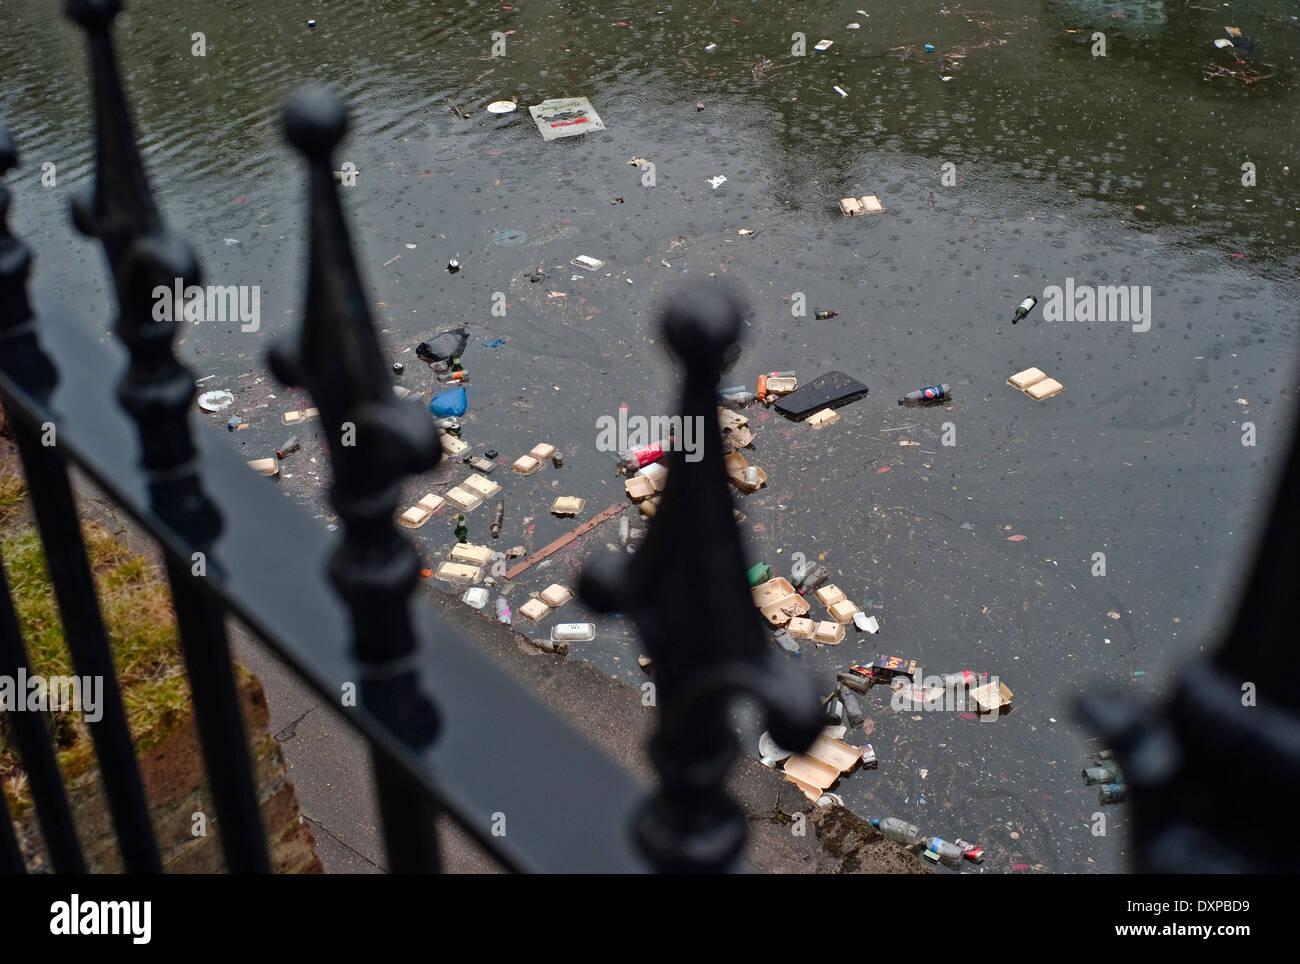 flotsam and jetsam canal through railings - Stock Image